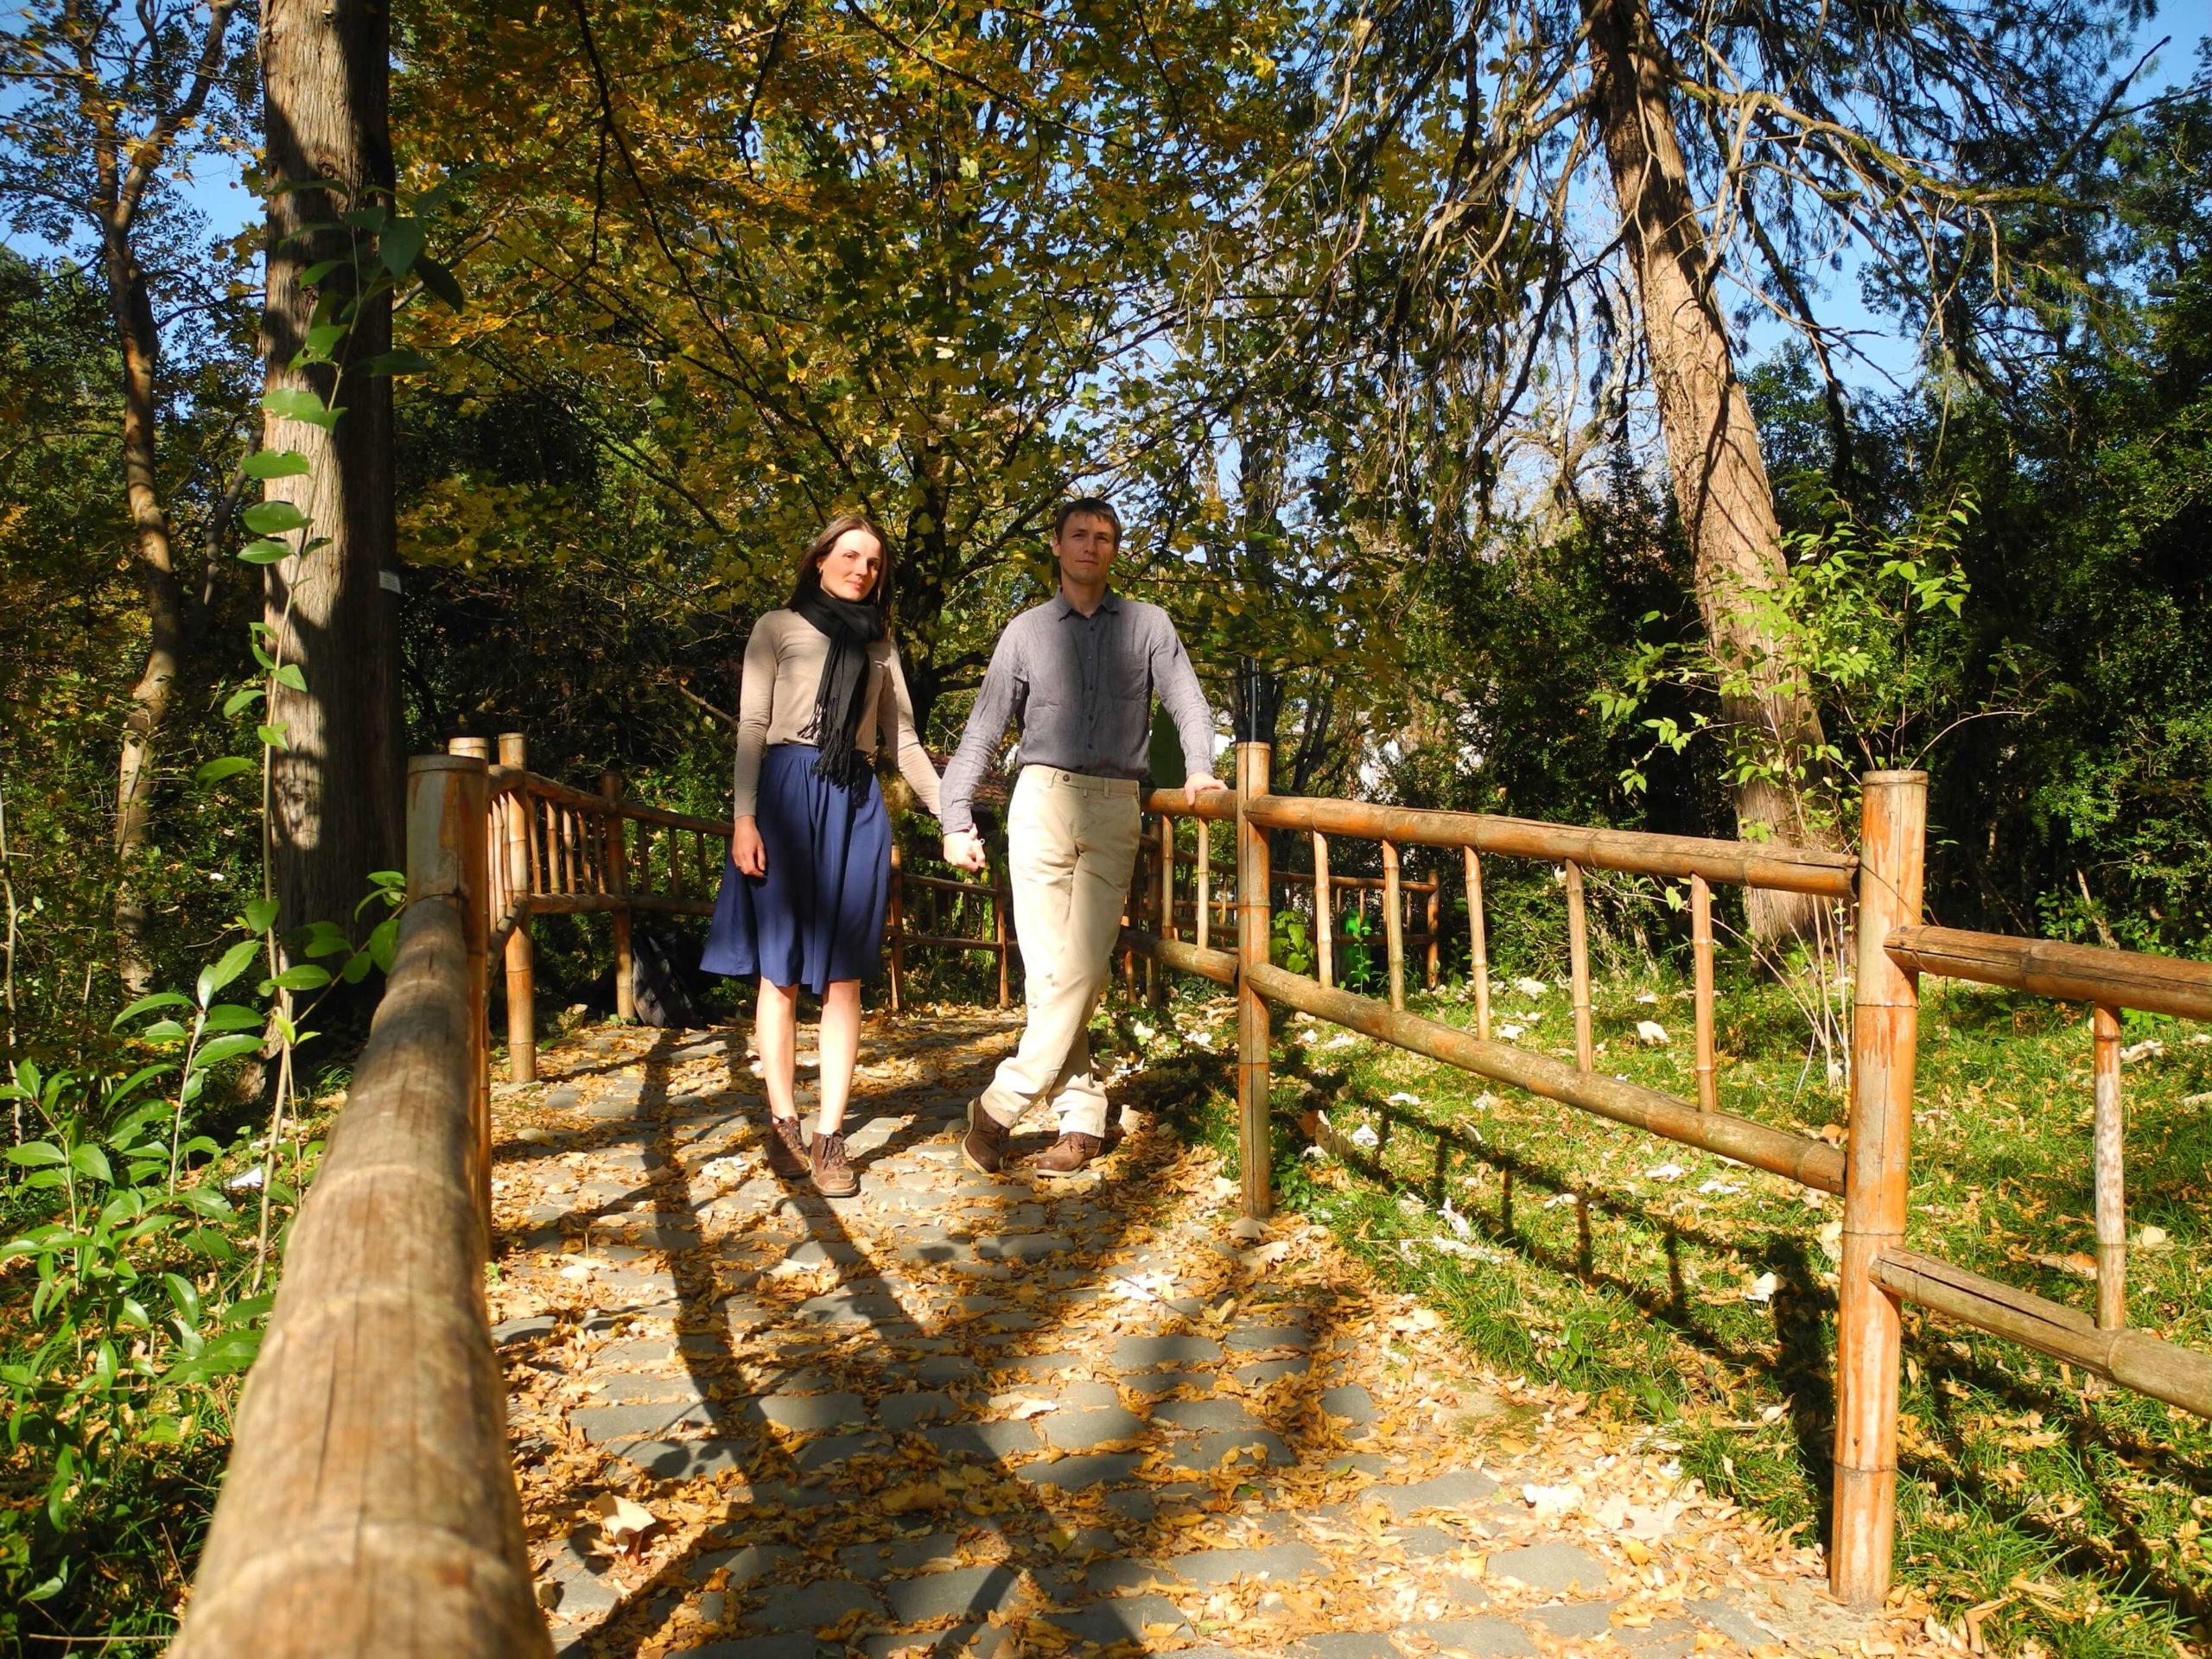 ботанический сад кутаси